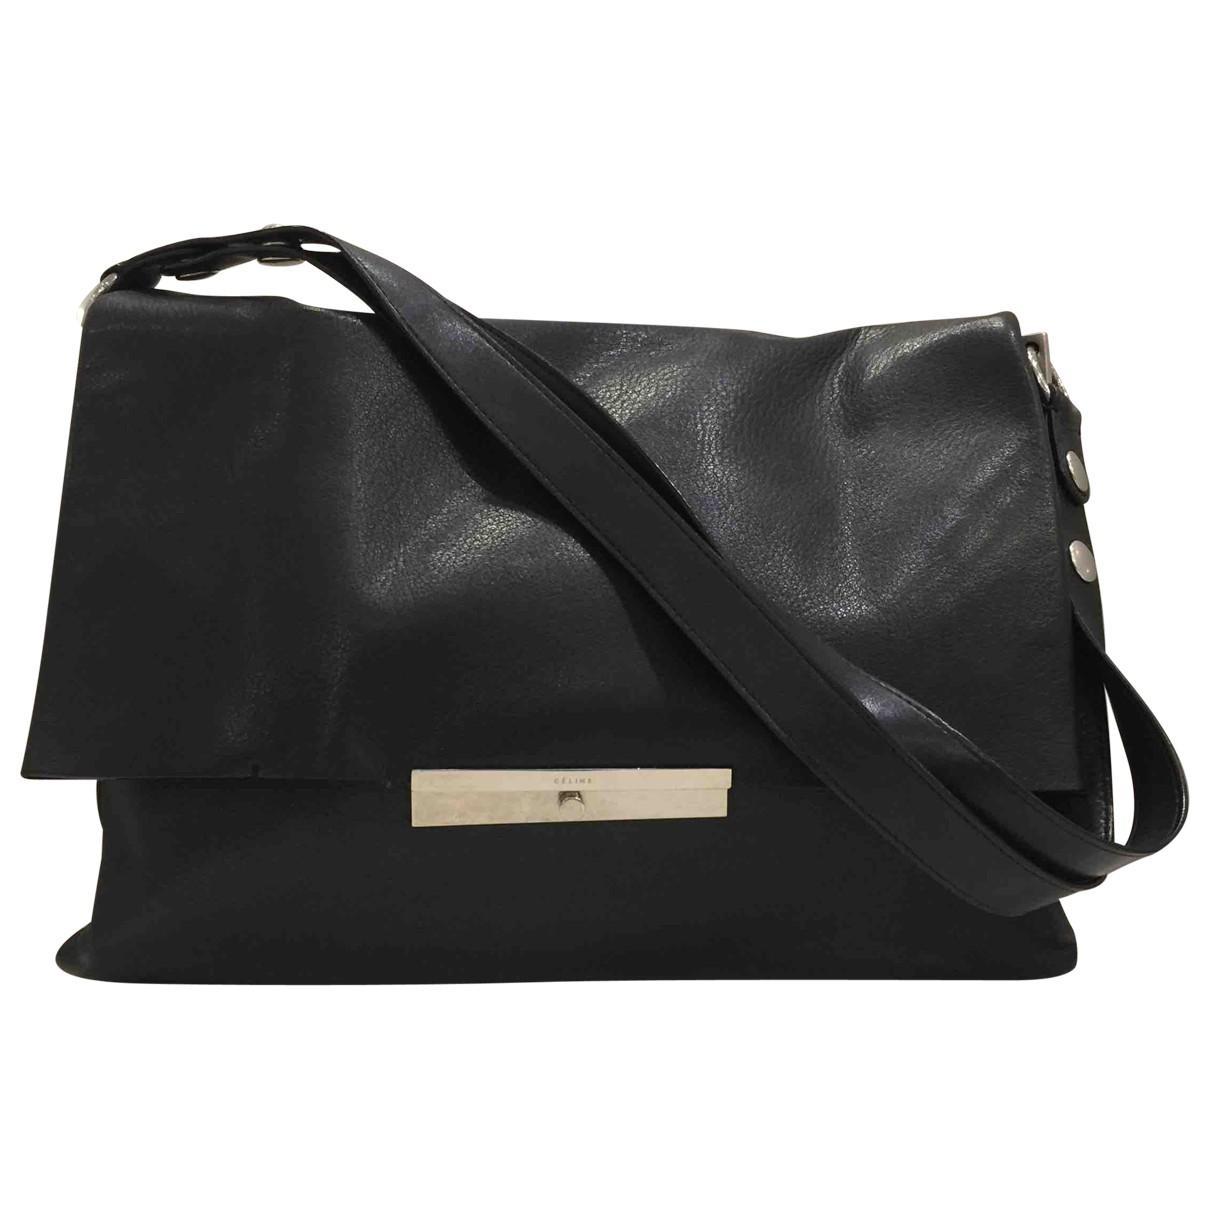 Pre-owned - Blade leather handbag Celine XvY0kvw2p